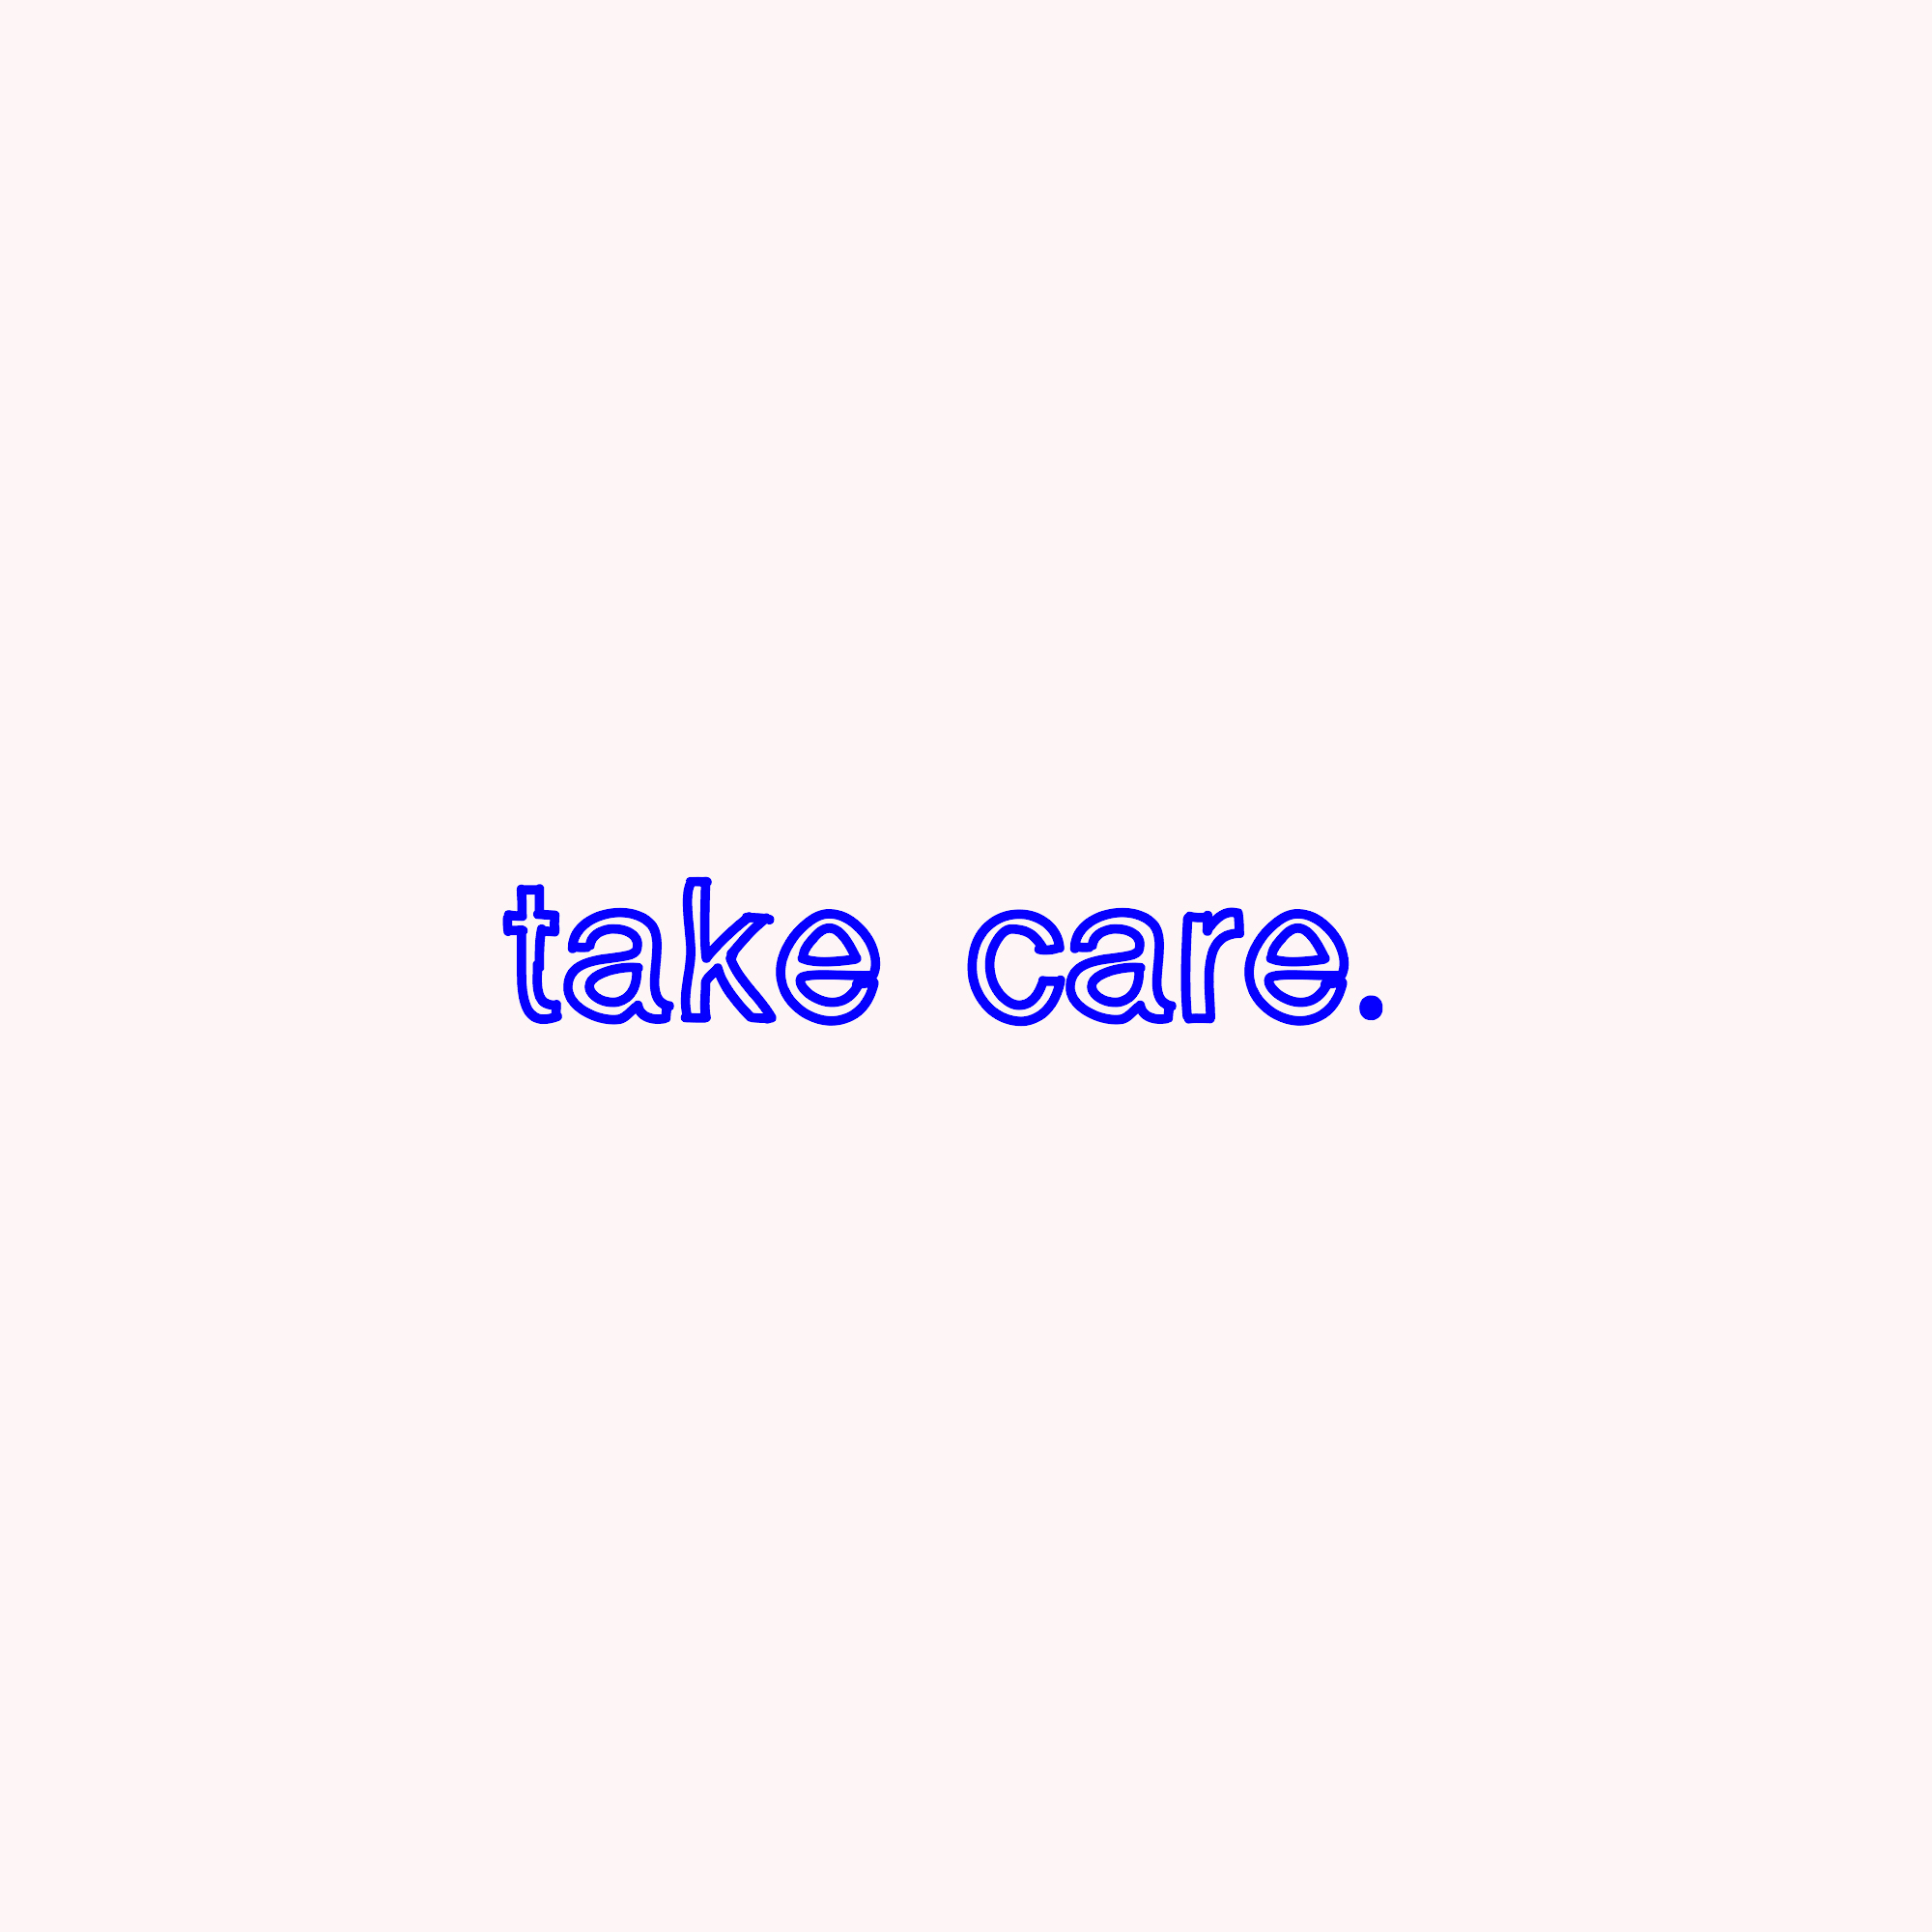 take care.jpg